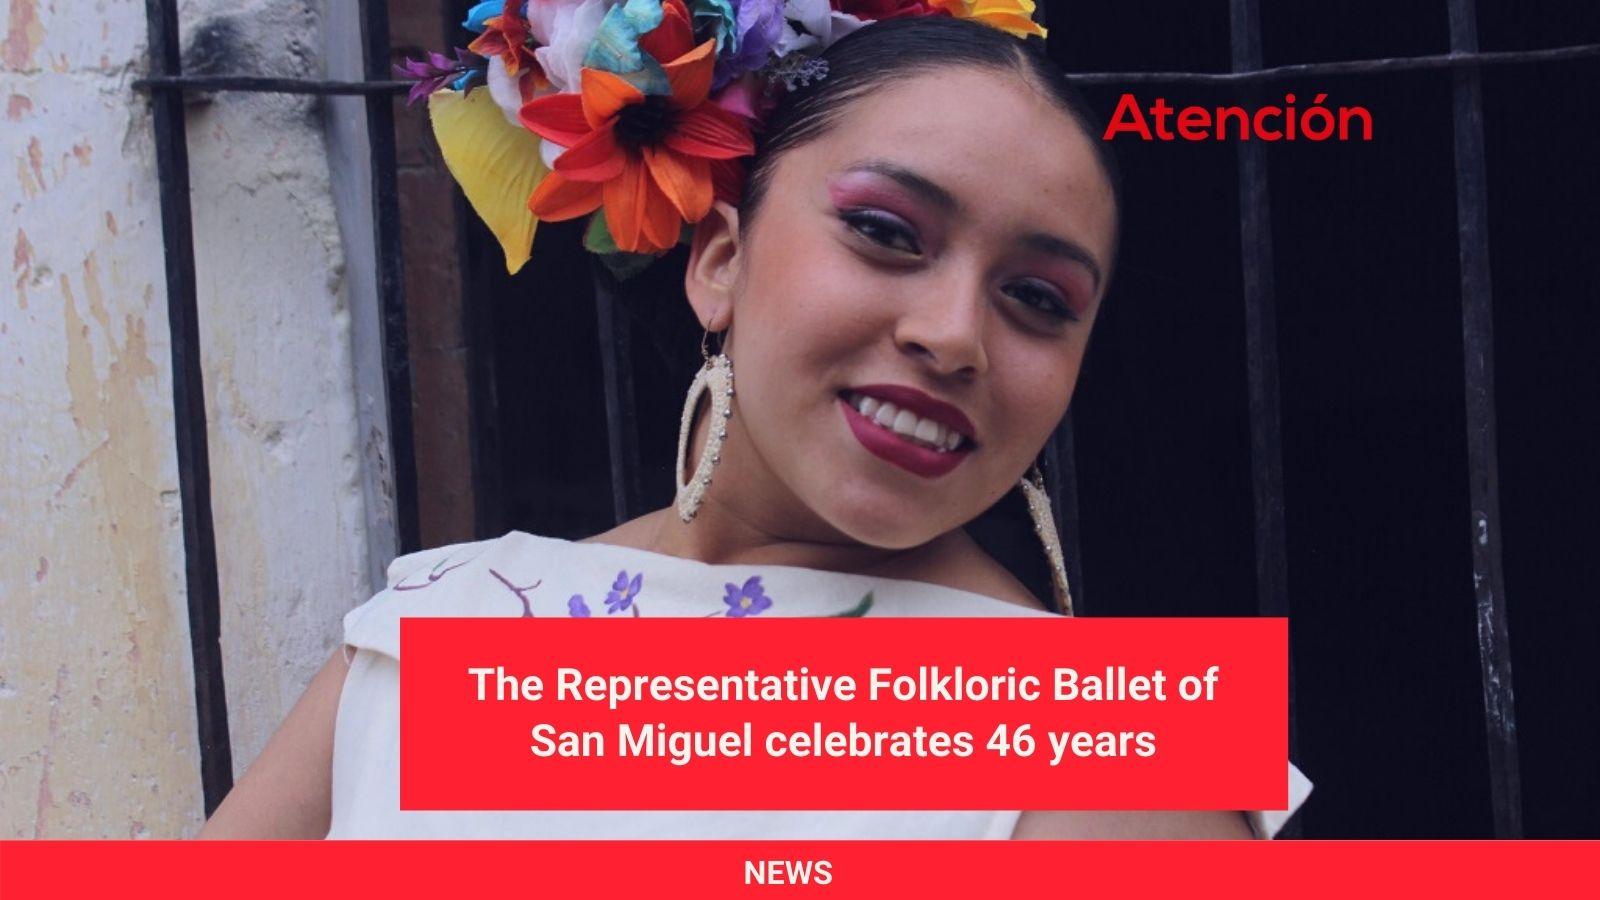 The-Representative-Folkloric-Ballet-of-San-Miguel-celebrates-46-years.jpg